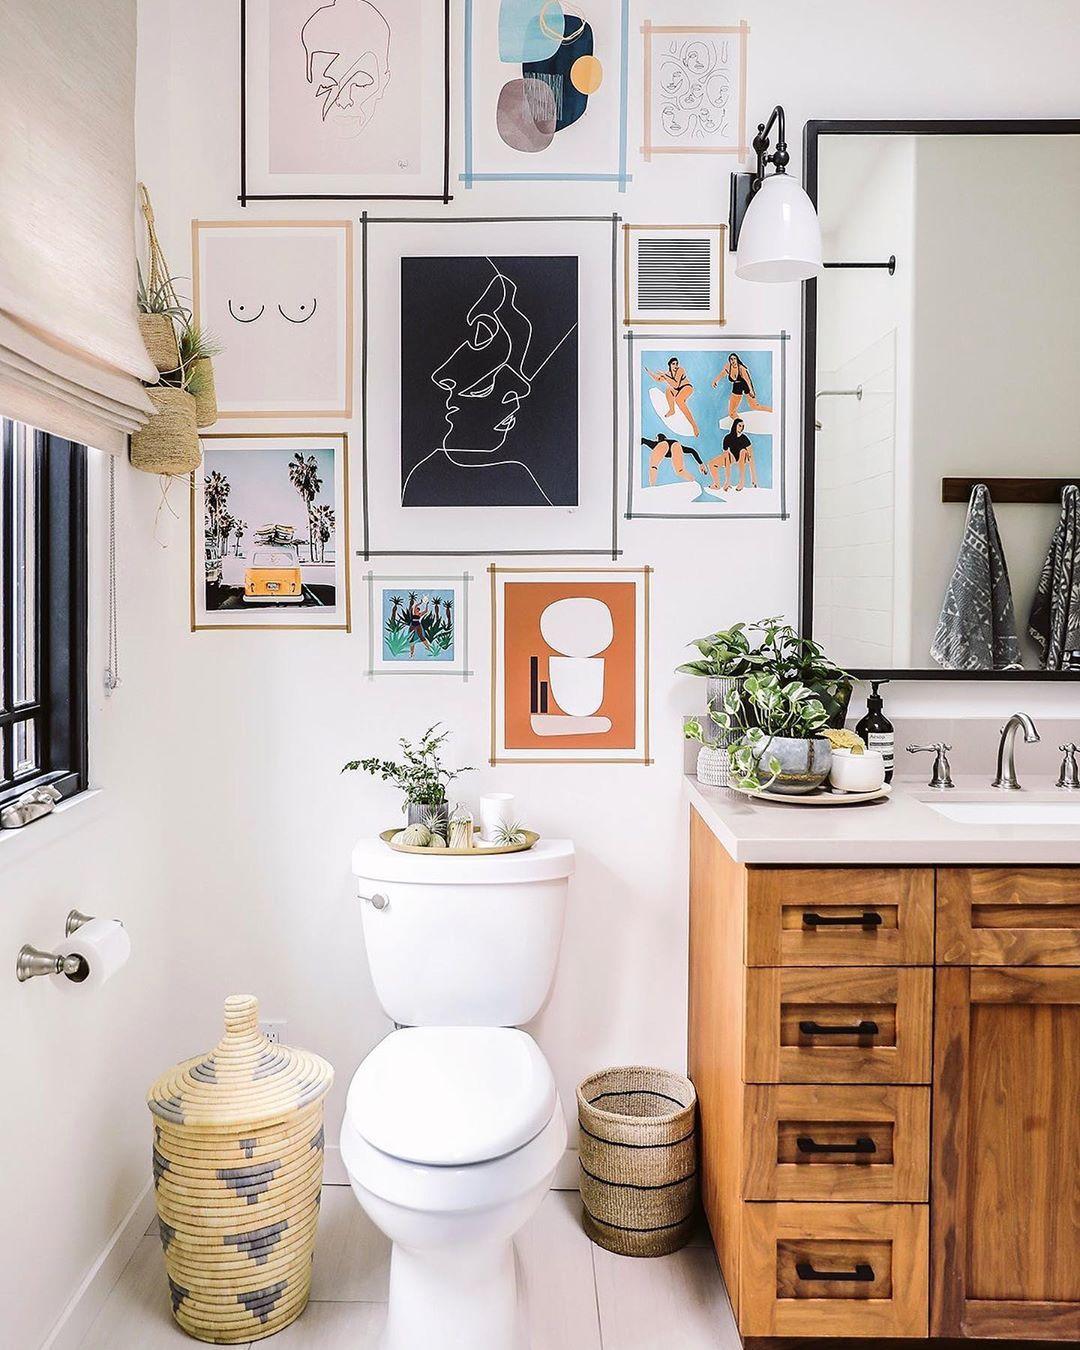 Grazia Uk On Instagram Is This Your Dream Bathroom Scenario We Ve Trawled Pinterest Fo Bathroom Wall Decor Bathroom Gallery Wall Bathroom Wall Decor Art